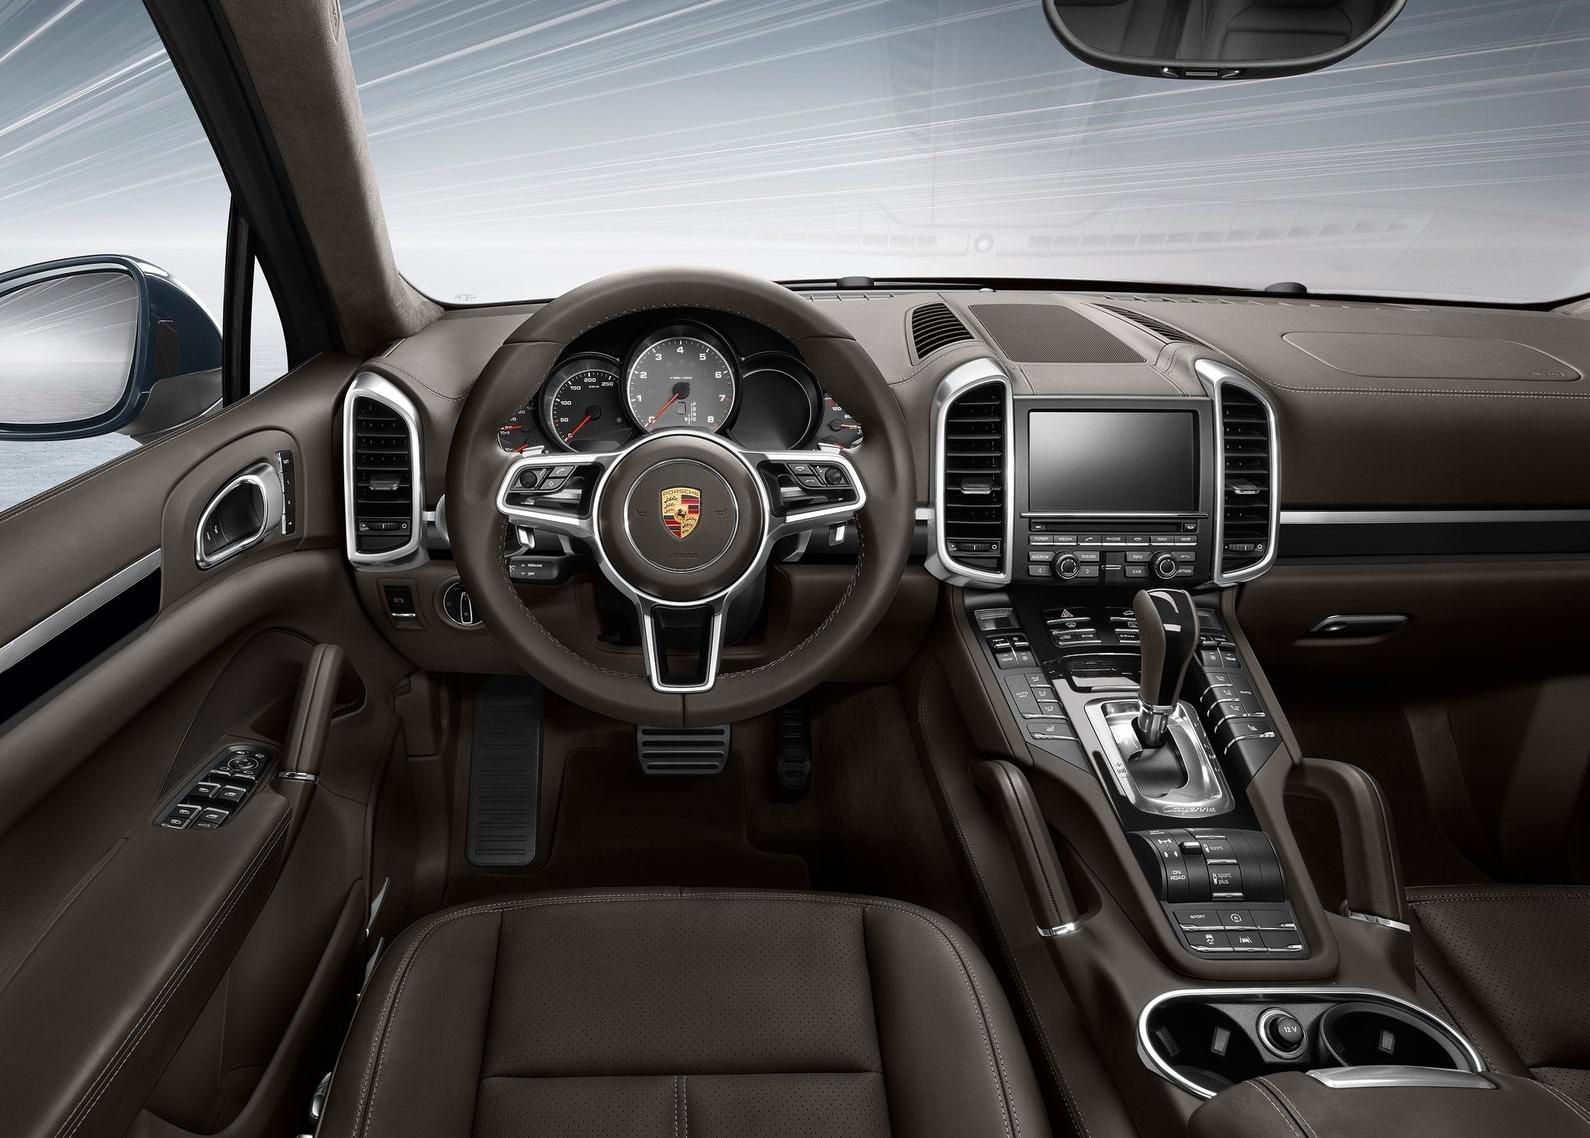 https://www.whatcar.lv/cars/Porsche/Cayenne/58bdb9cae9936d9b39b8f906525feb05.jpg